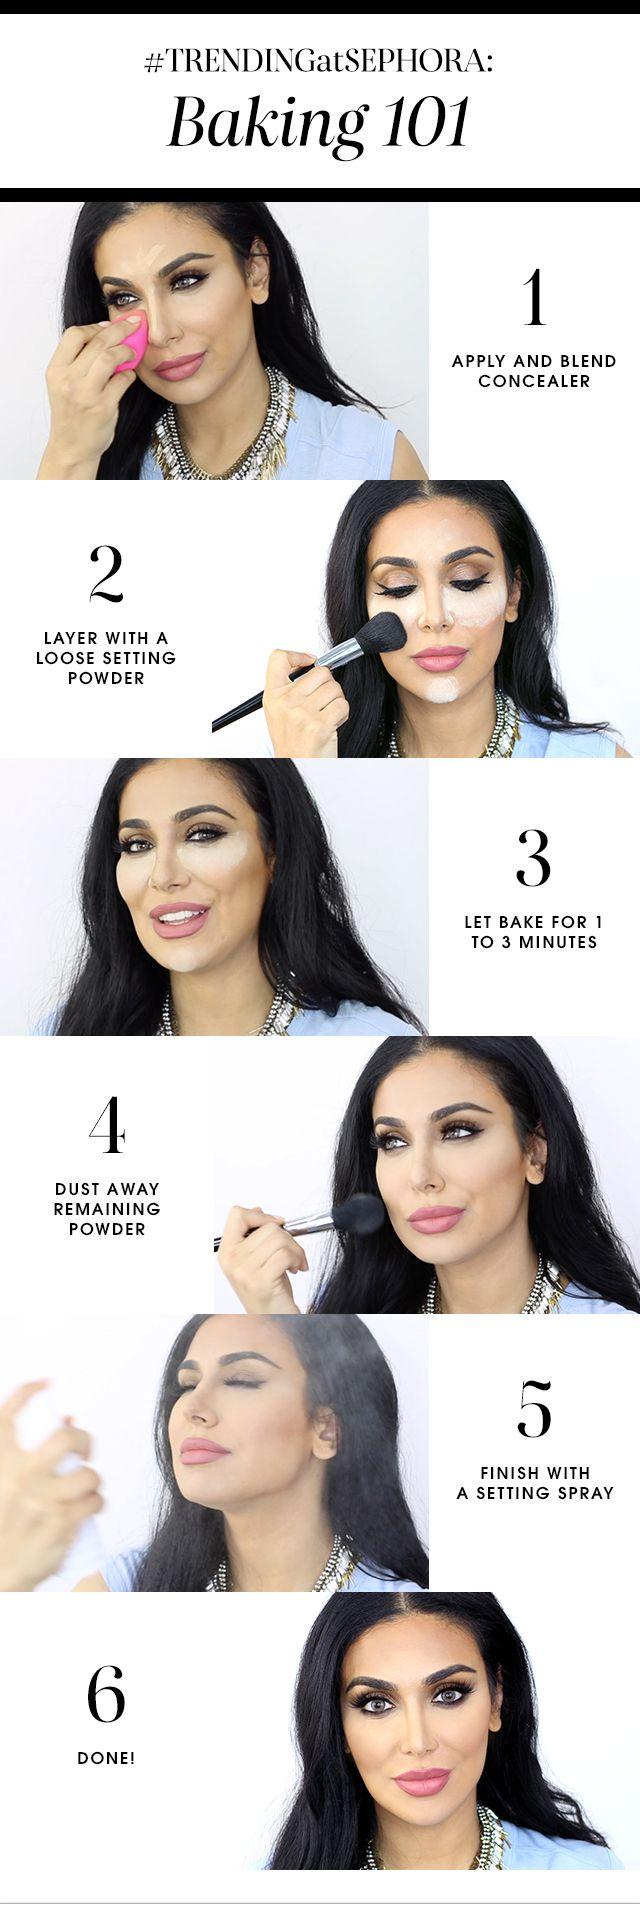 técnica de maquillaje baking